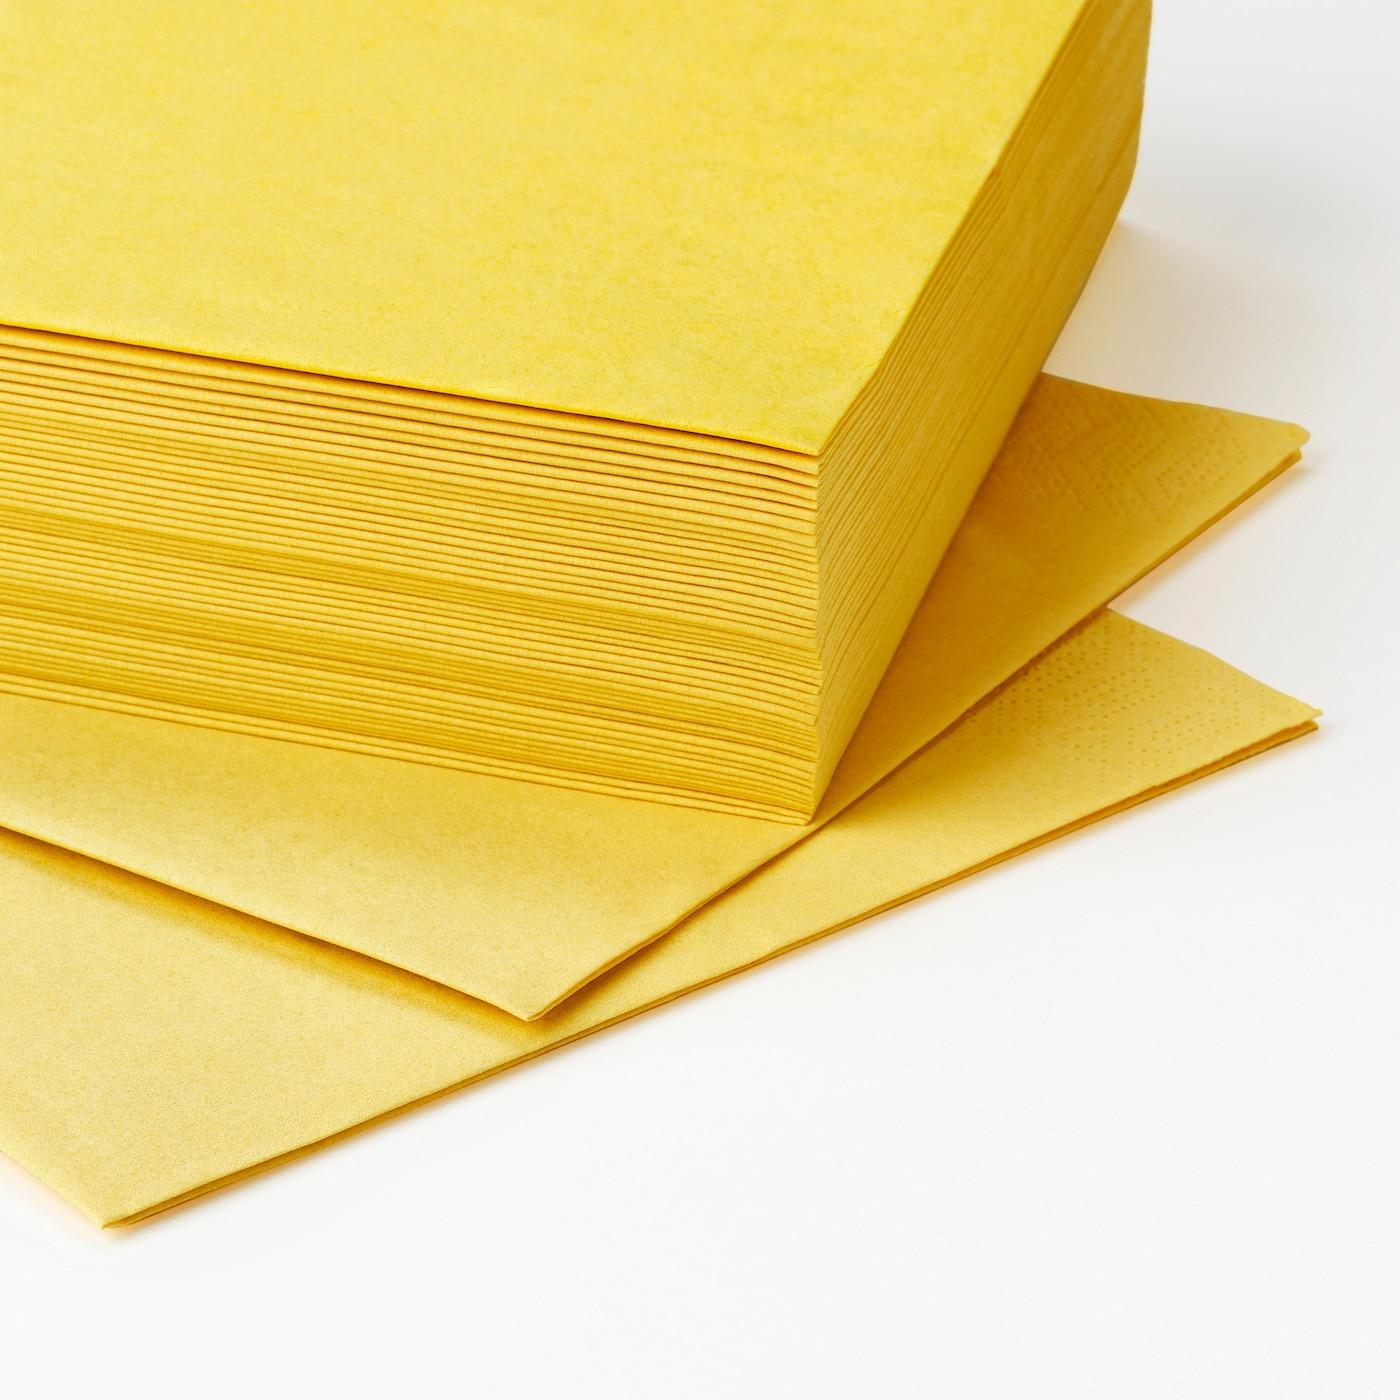 20/x 20/x 5/cm//–/Pack of 50/Units /Yellow Ikea FANTASTISK Paper Napkin Paper/